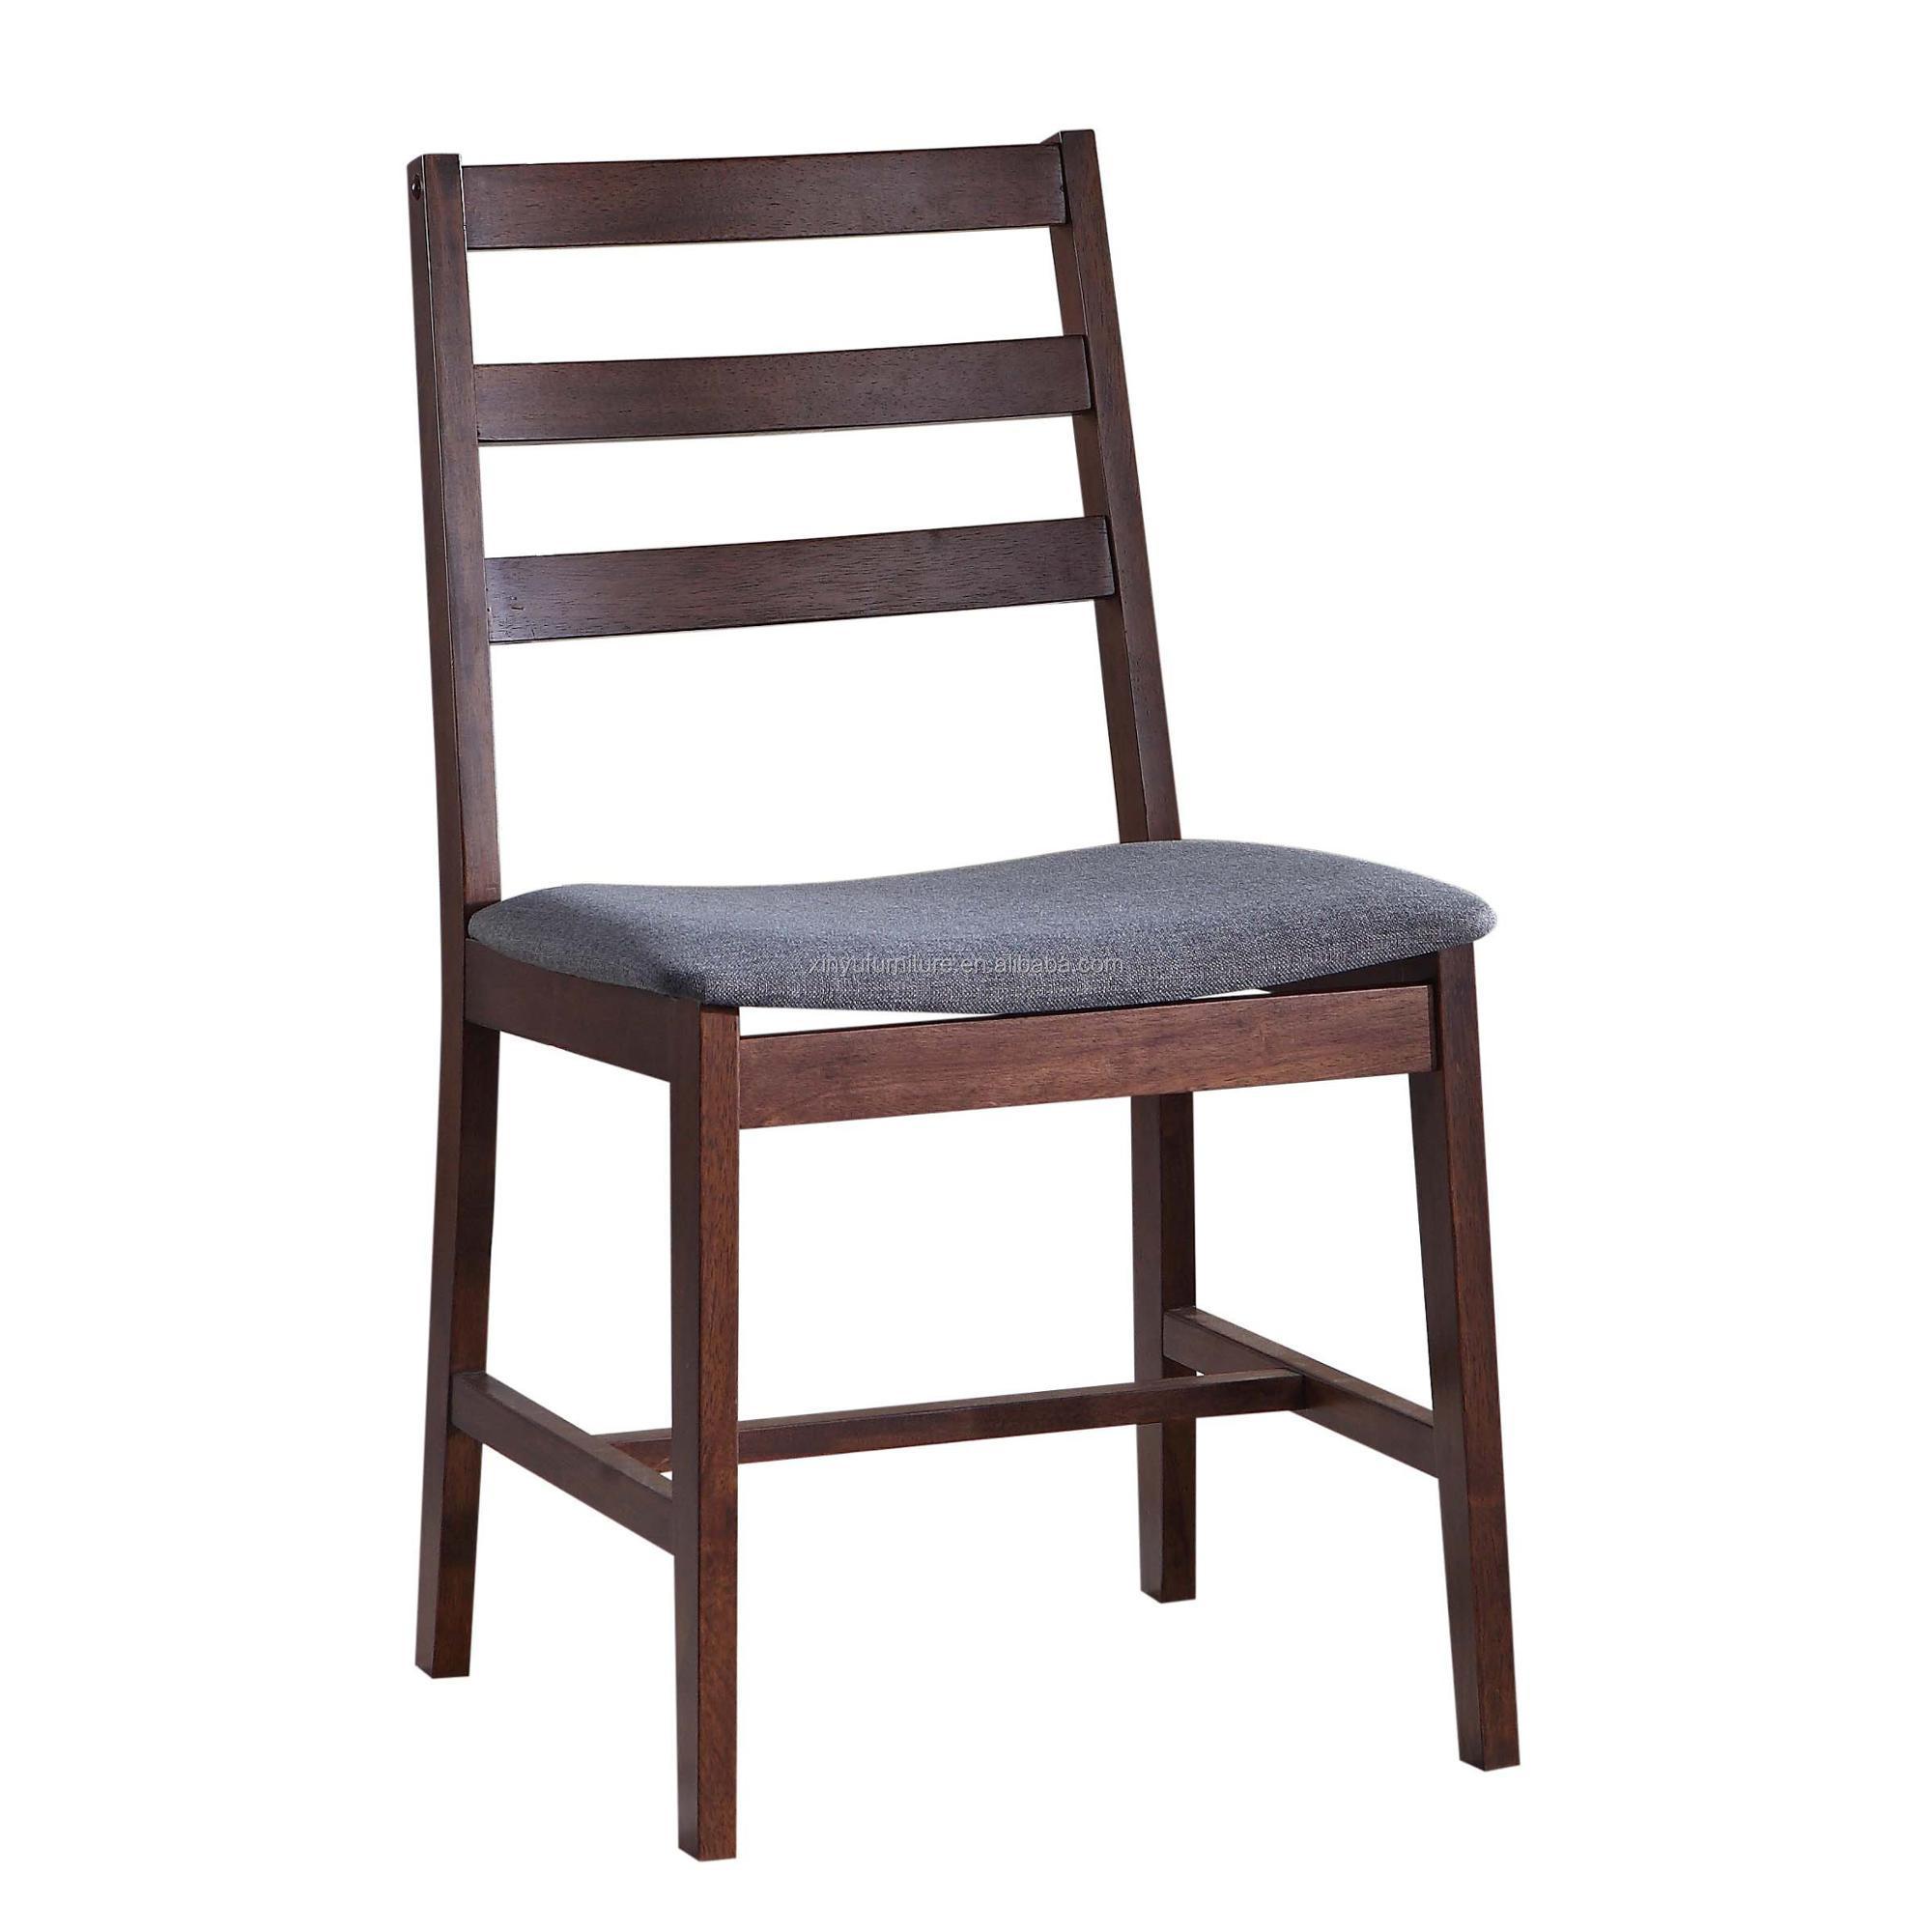 Sedie Moderne Design In Legno.Offerte Sedie Moderne All Ingrosso Acquista Online I Migliori Lotti